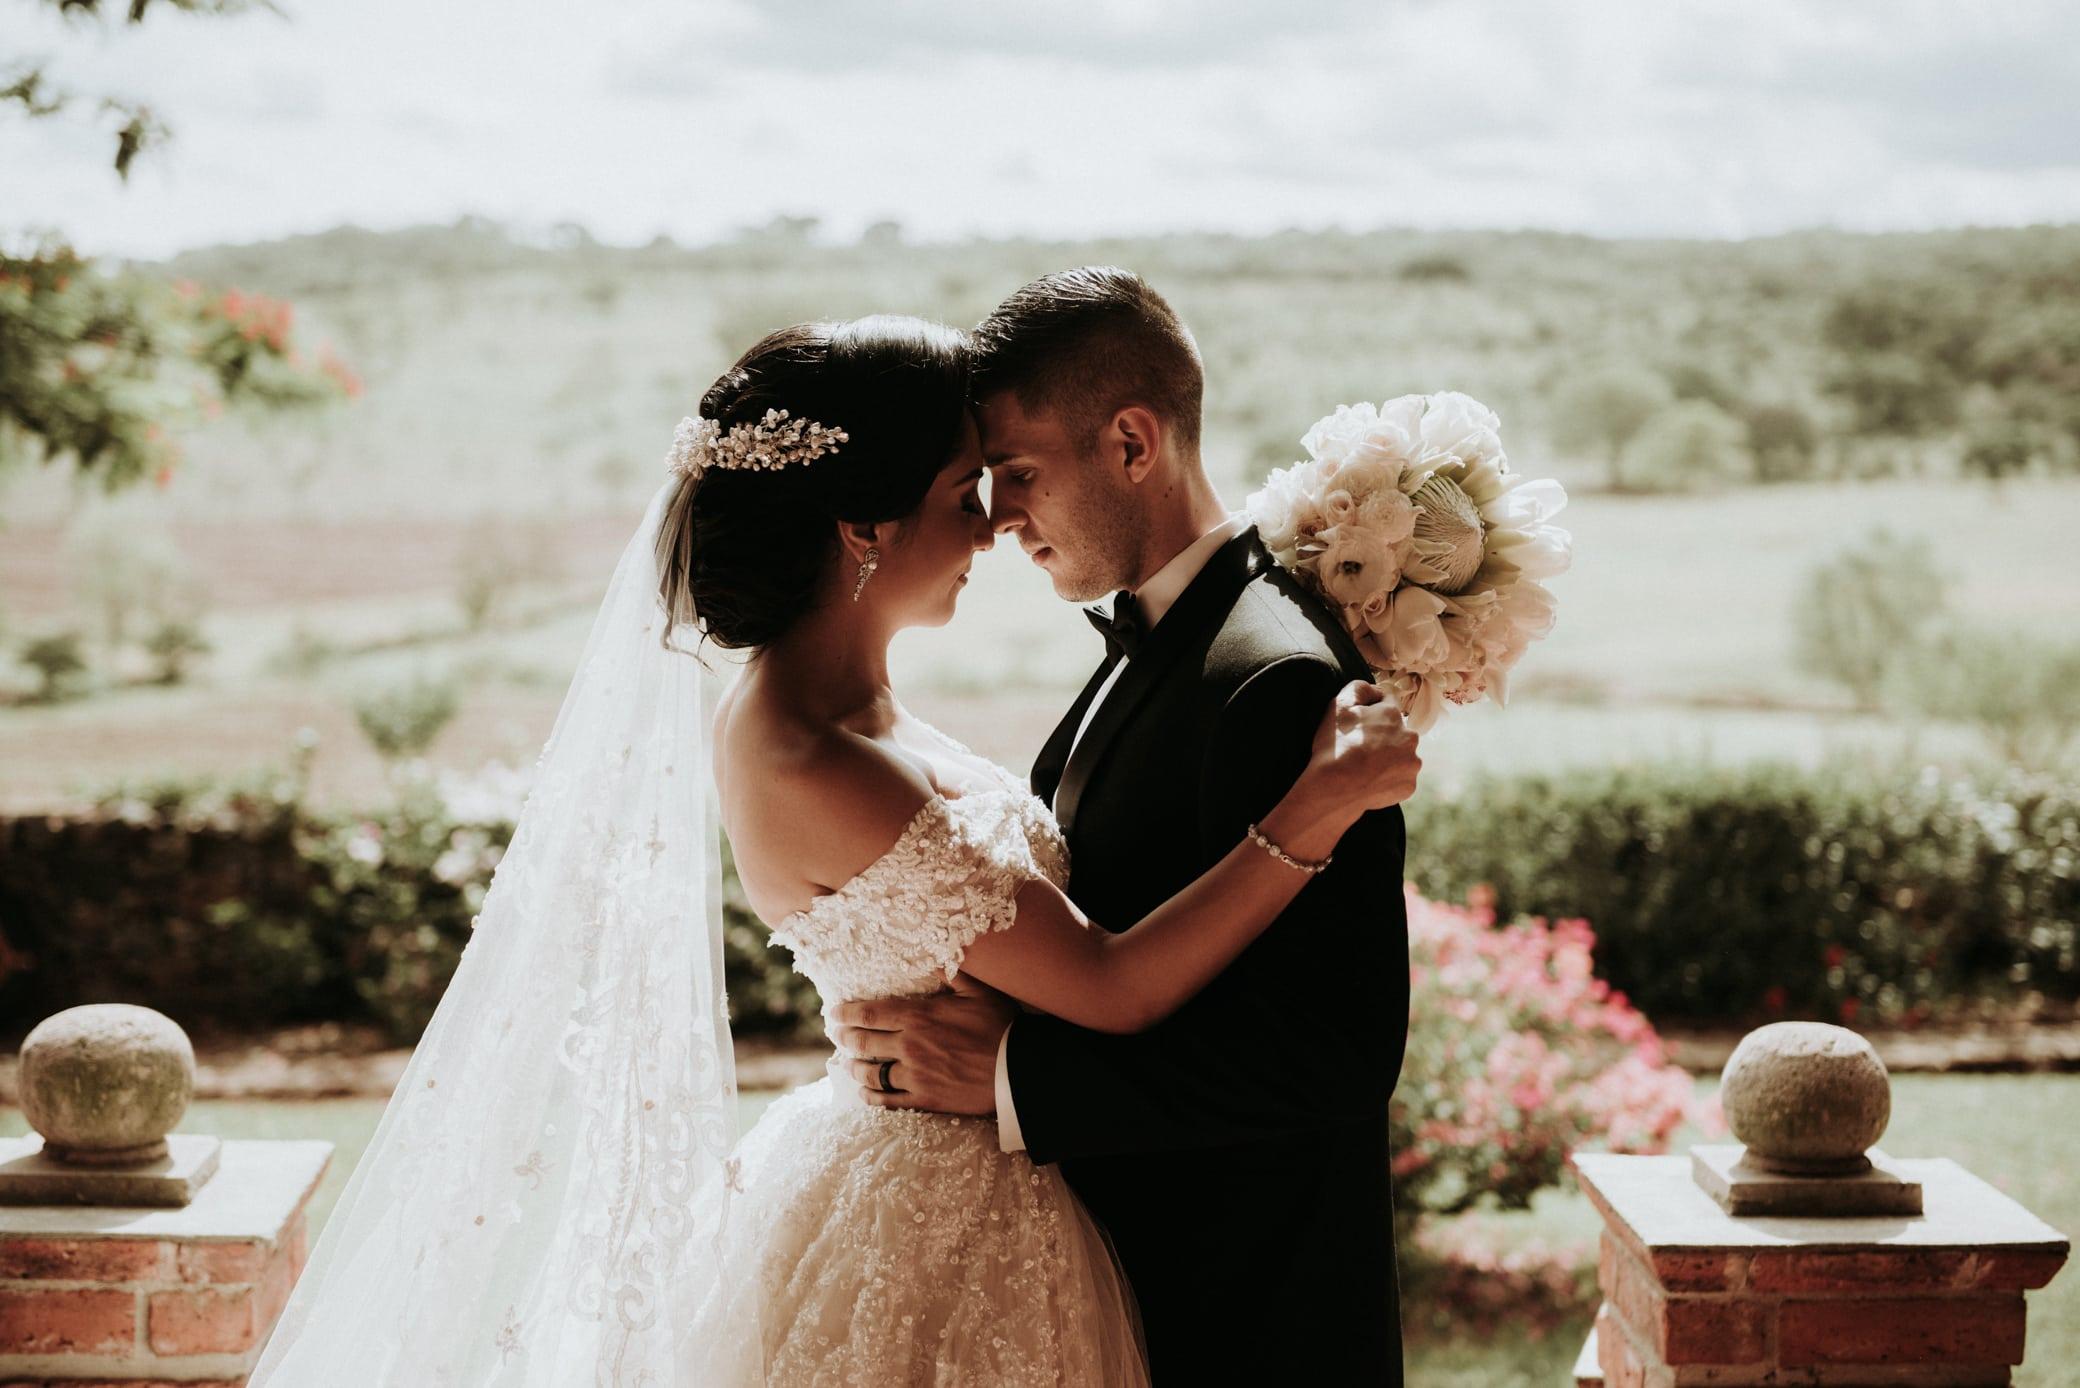 Requisitos para casarse con un extranjero en méxico